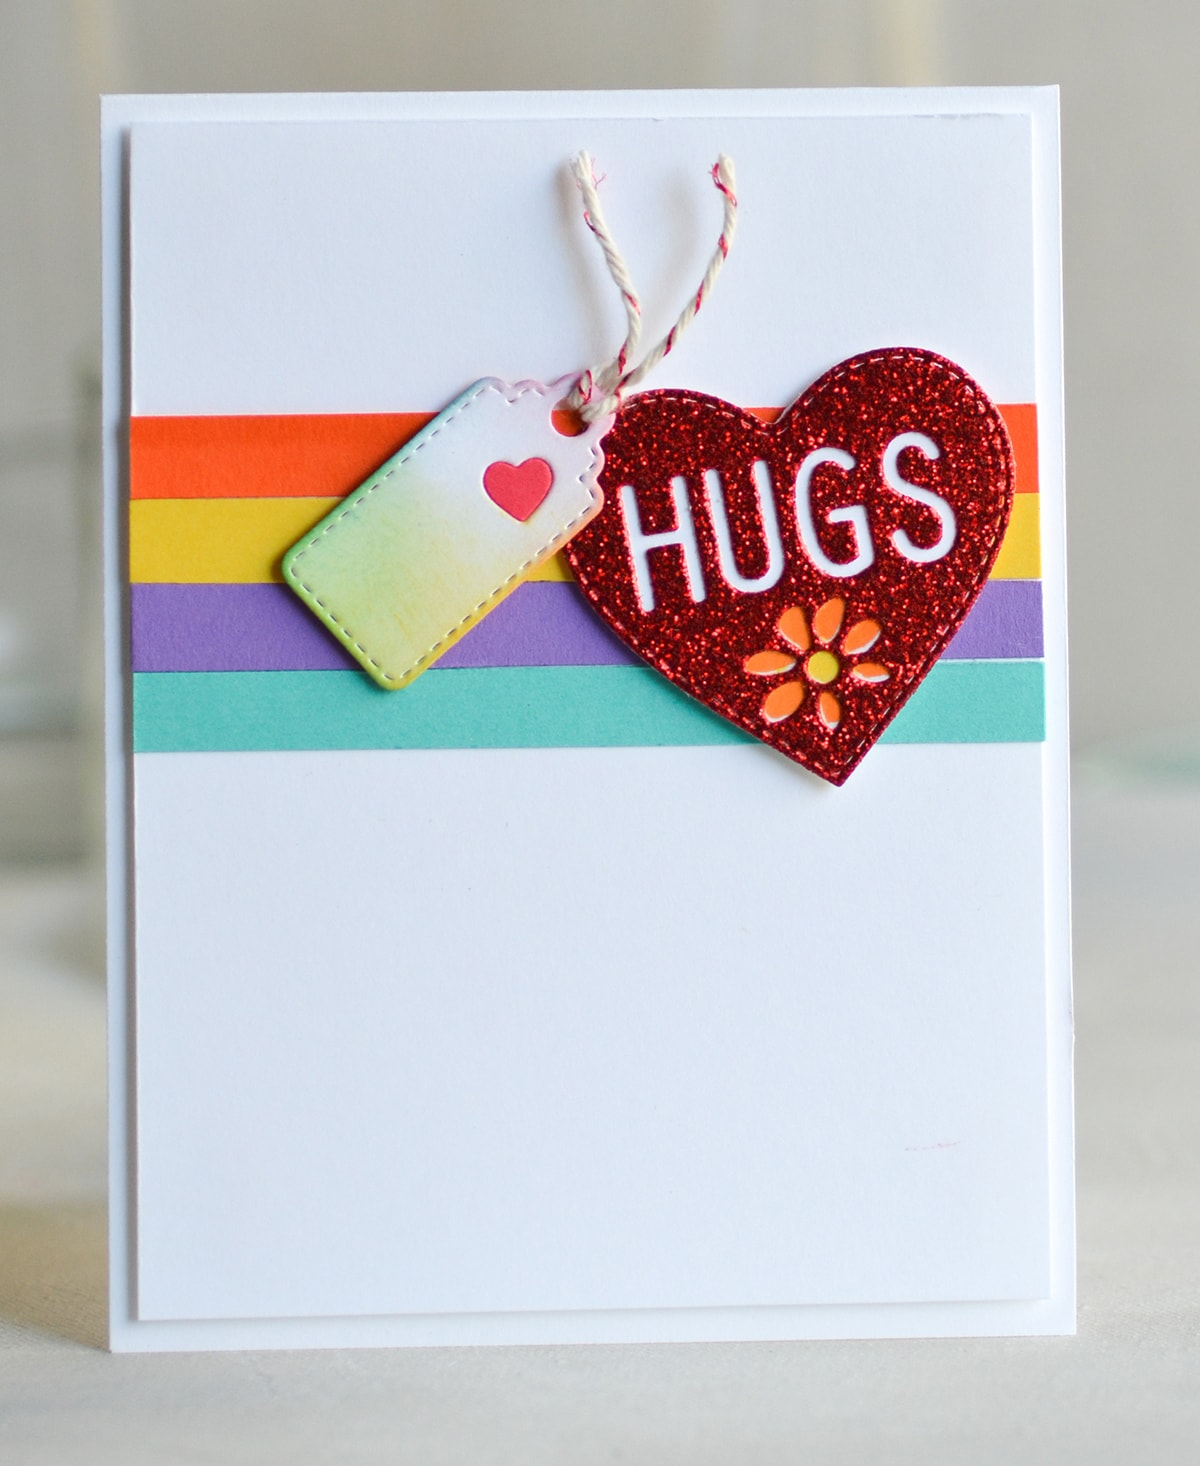 poppy stamps Heart Tag Trio 이미지 검색결과